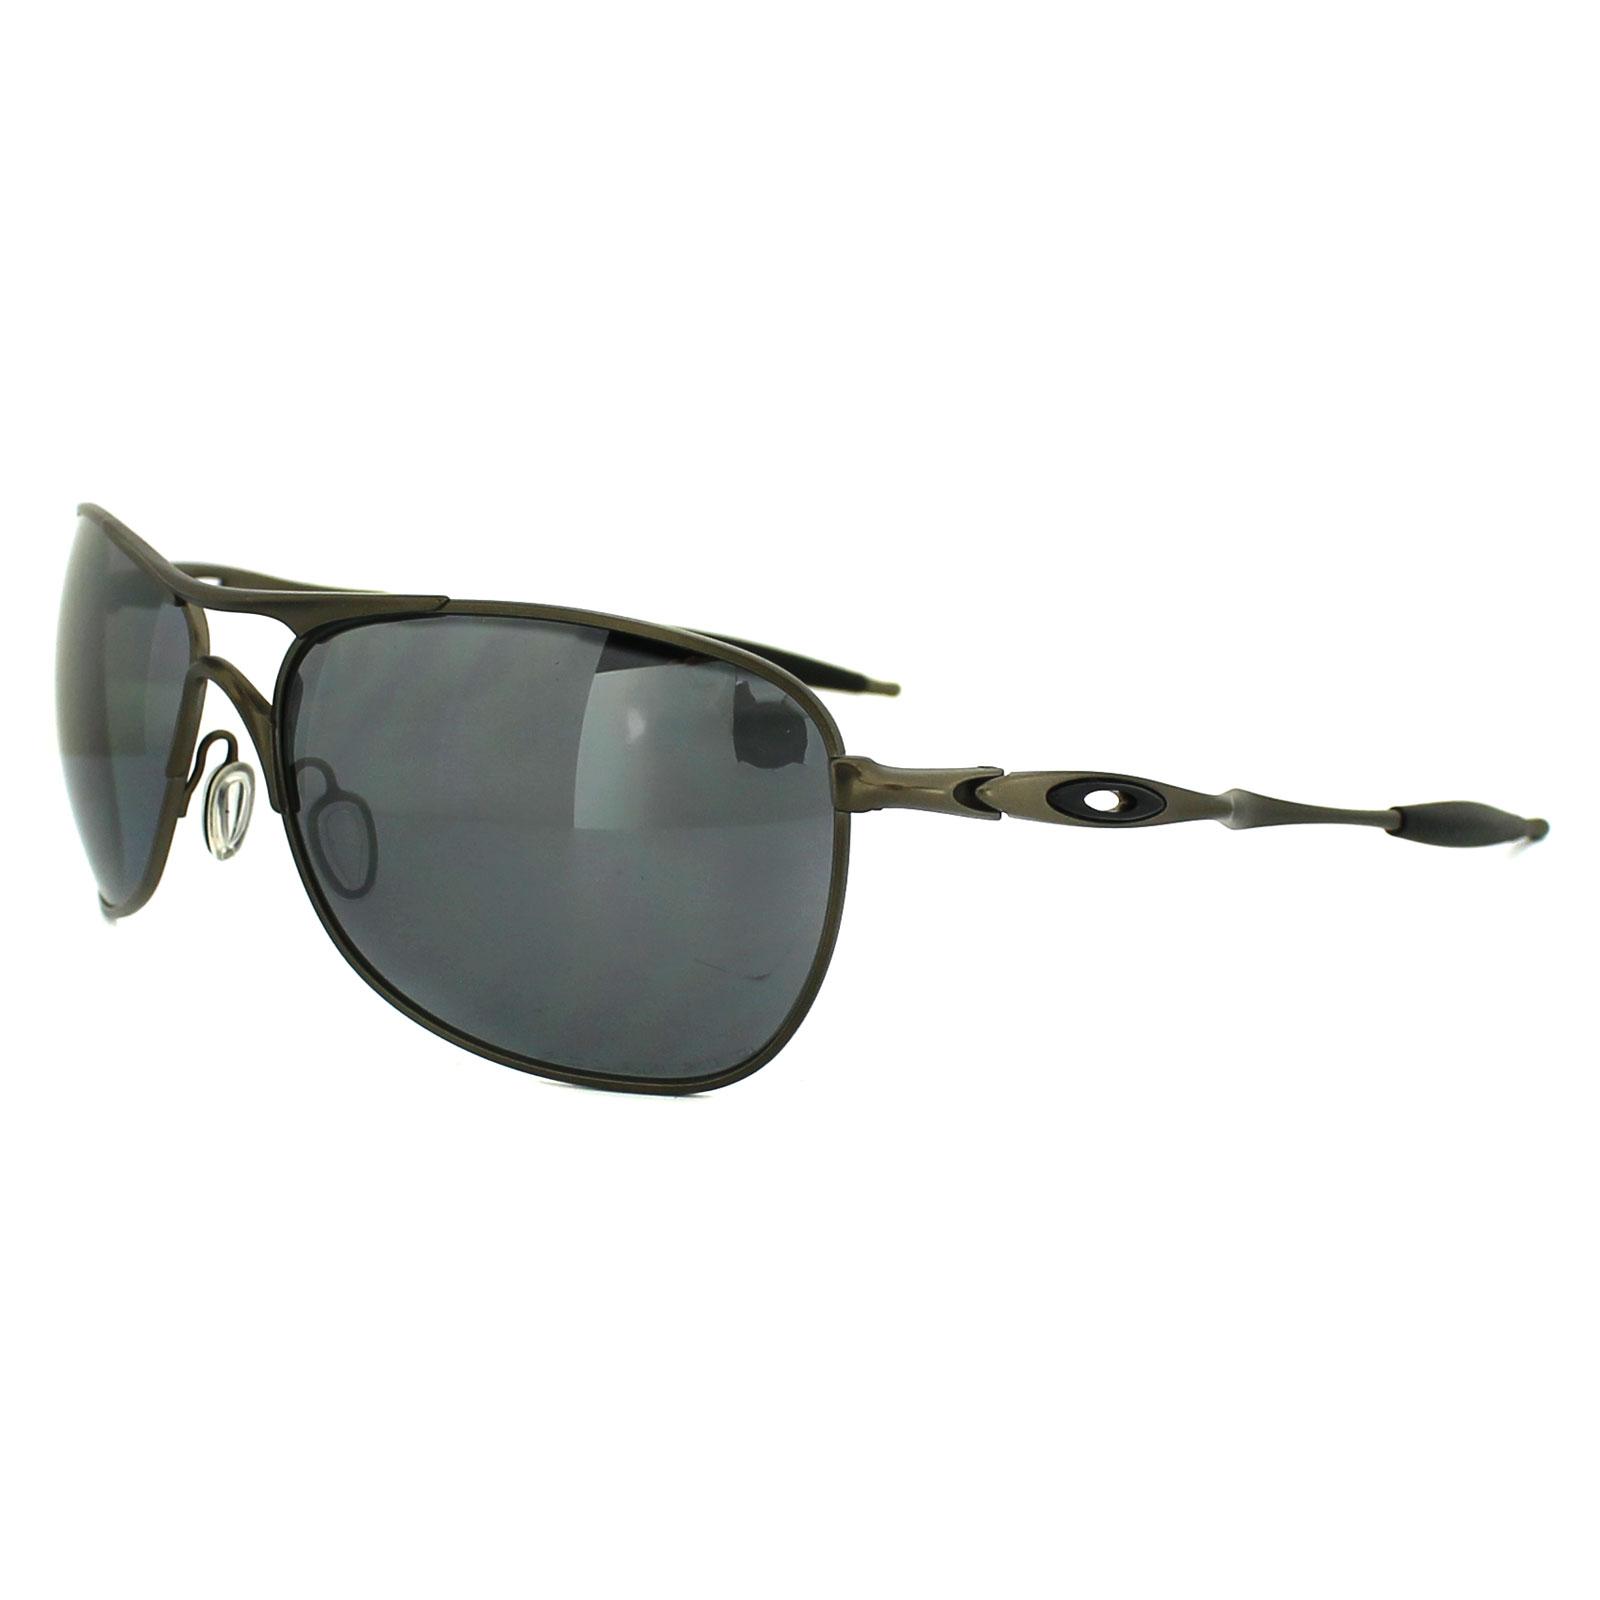 d93f1edb8b Oakley Crosshair Sunglasses Uk « Heritage Malta